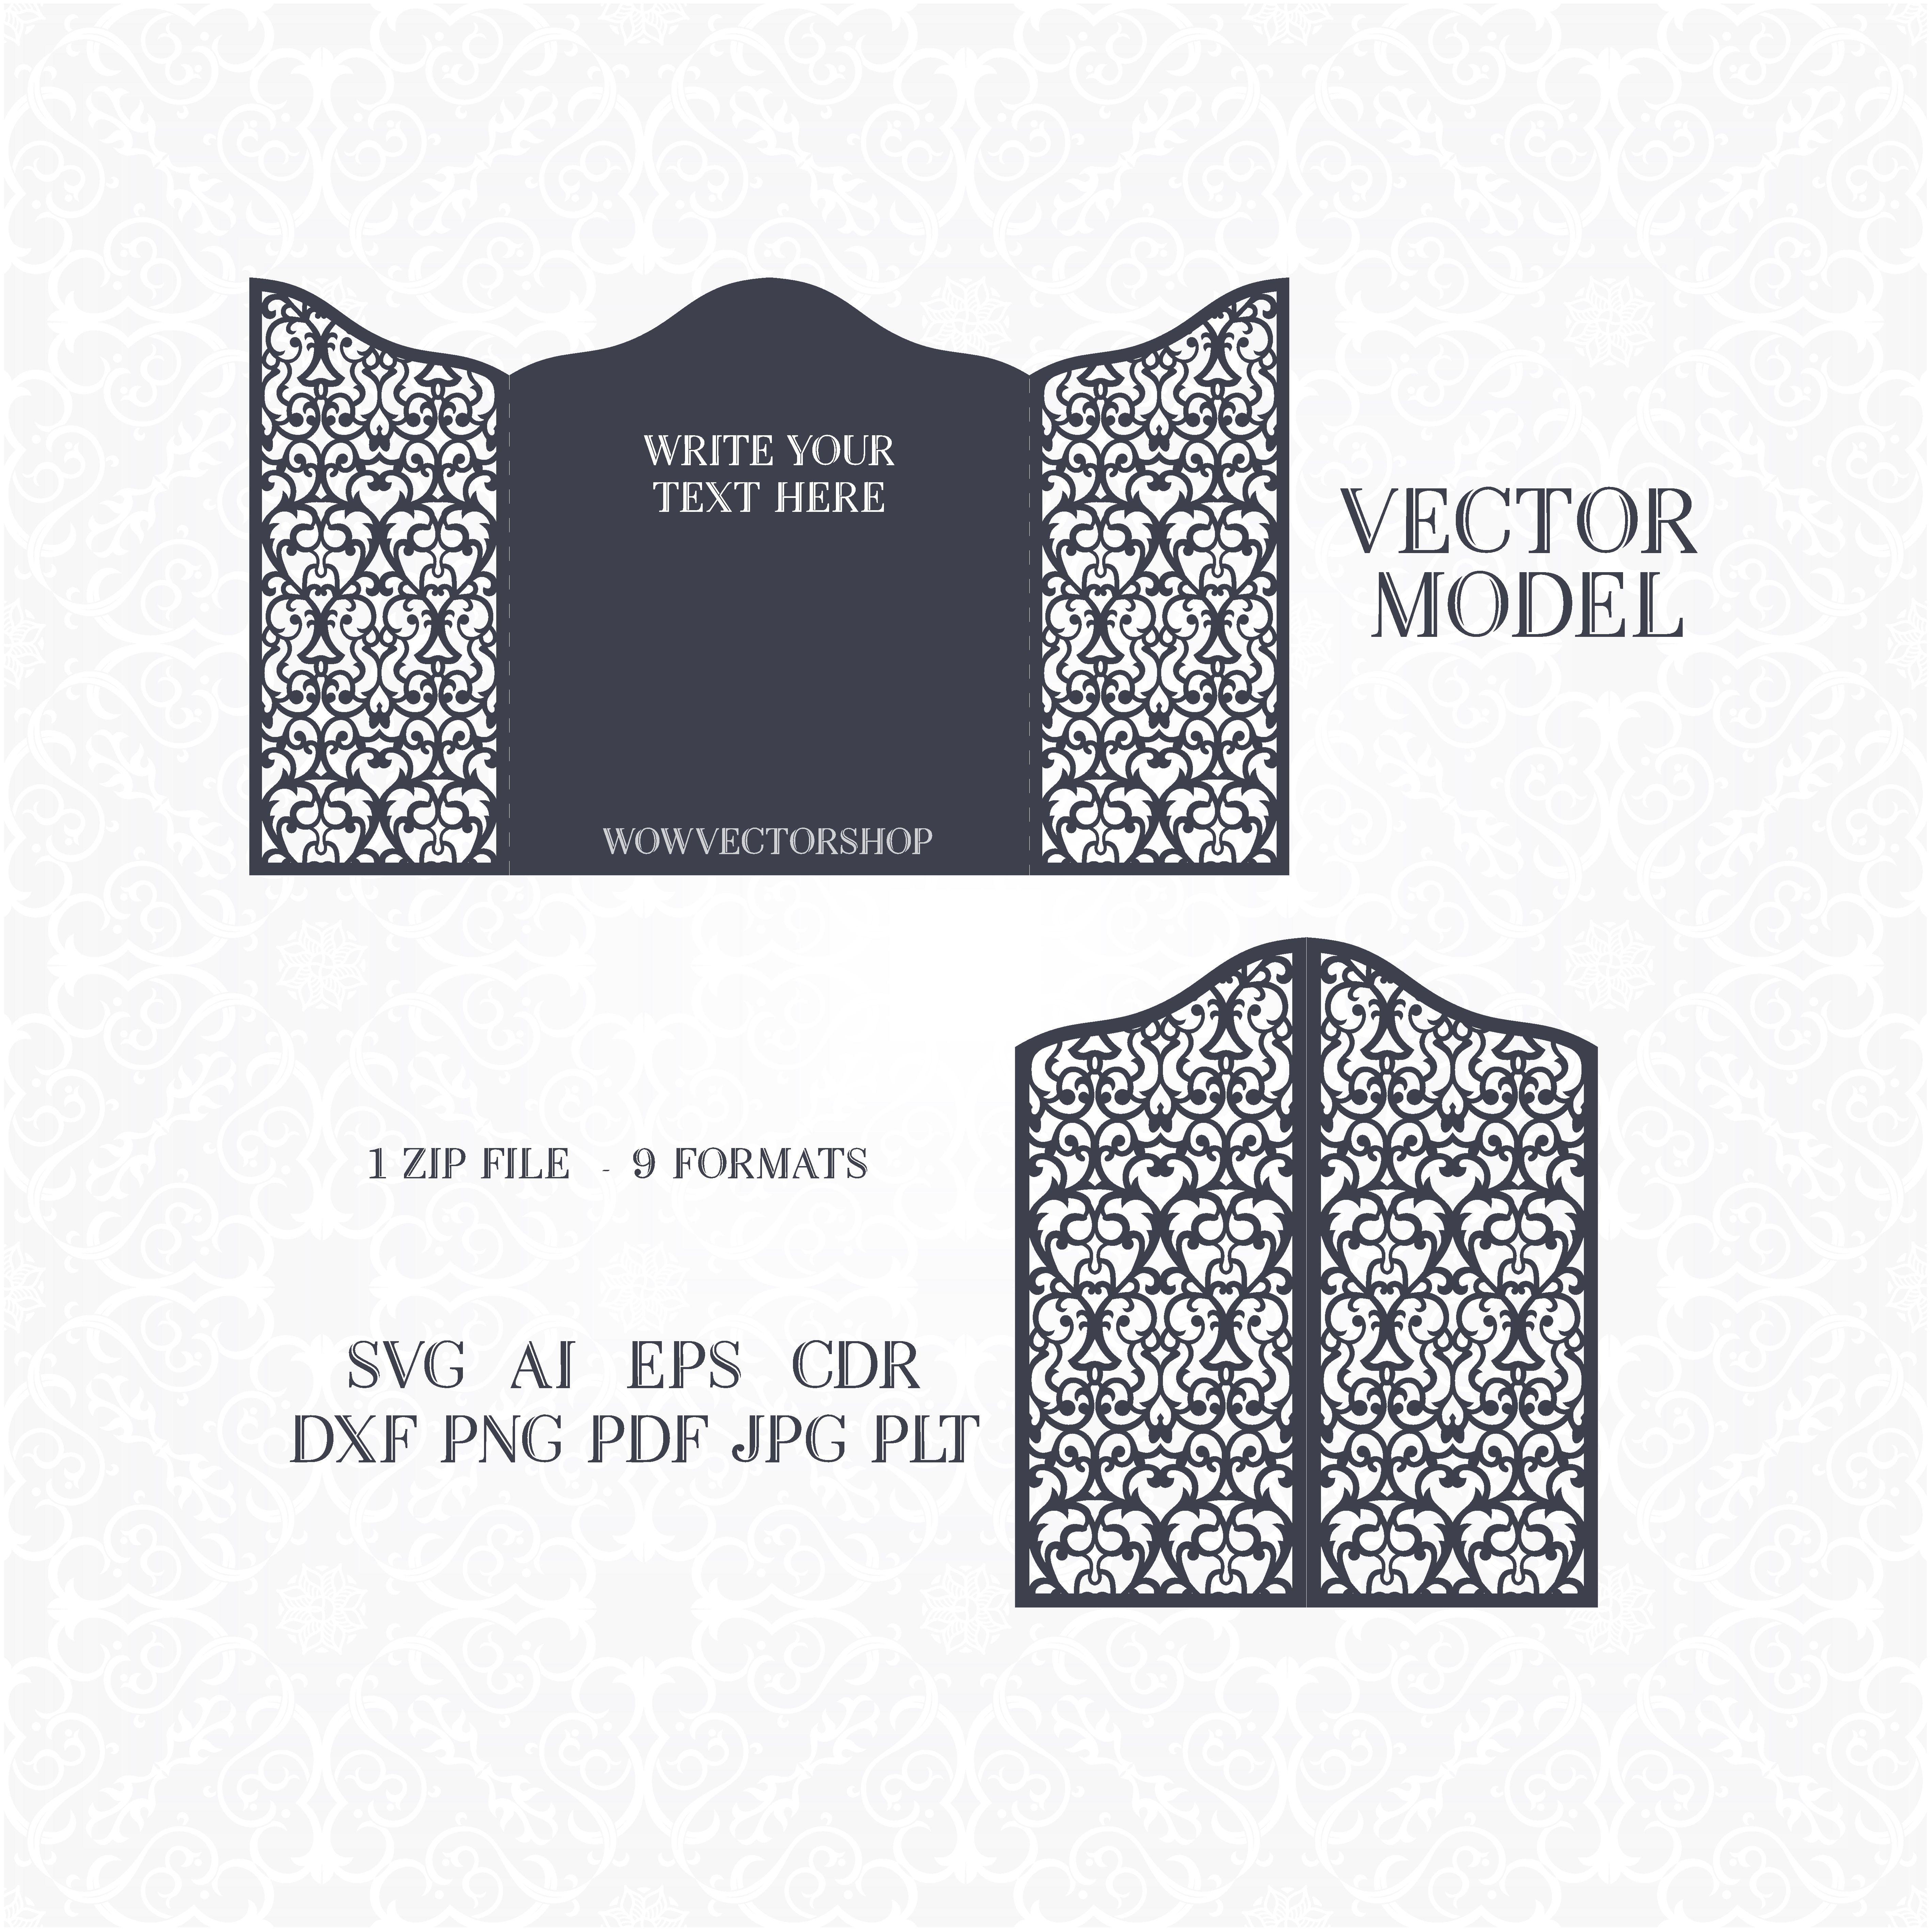 laser cut wedding invitation template https://www.etsy.com/shop ...